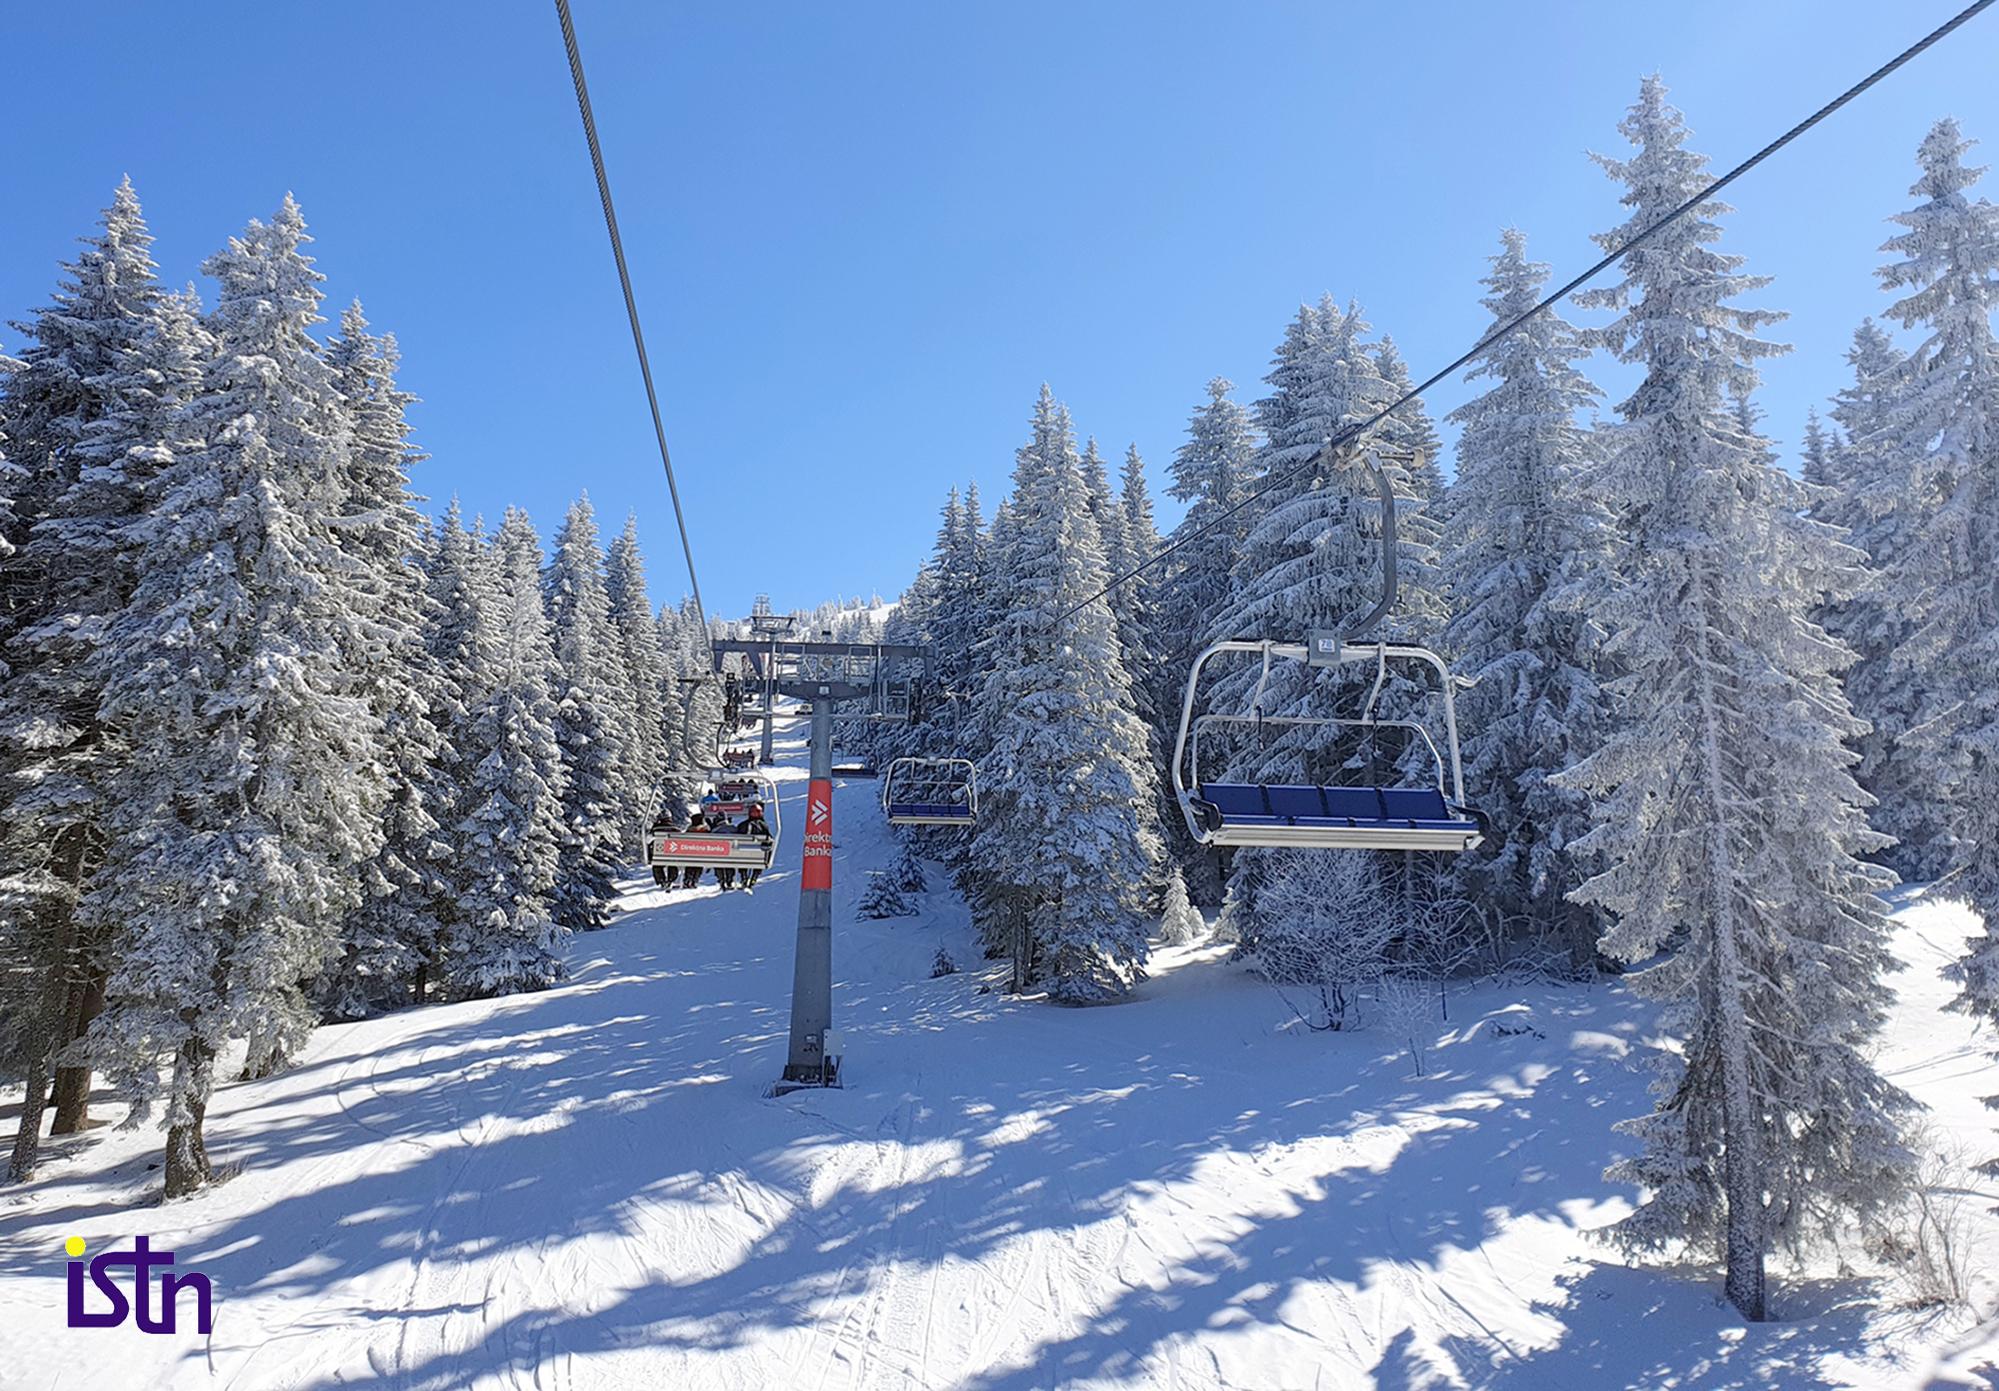 Ski centar Kopaonik, ISTN